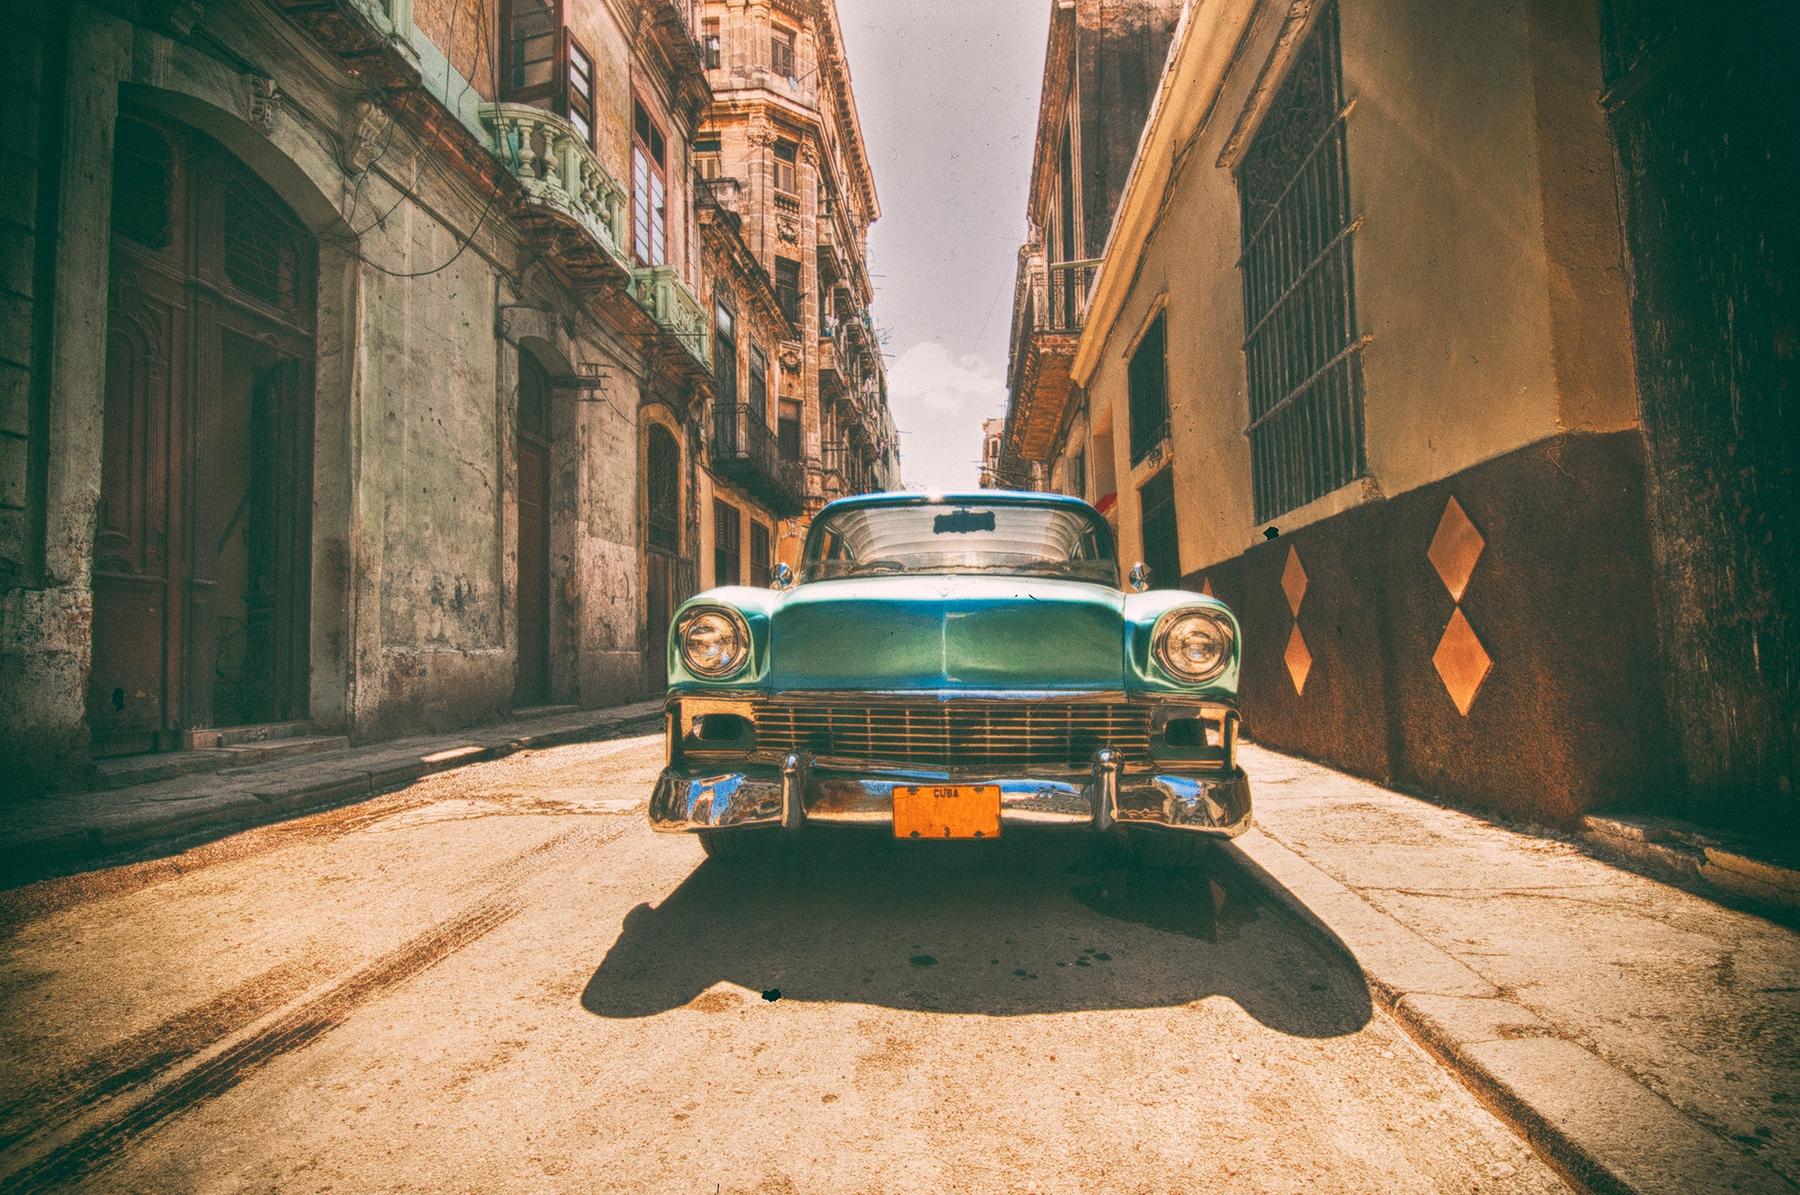 Ретроавтомобиль на улице Гаваны на Кубе